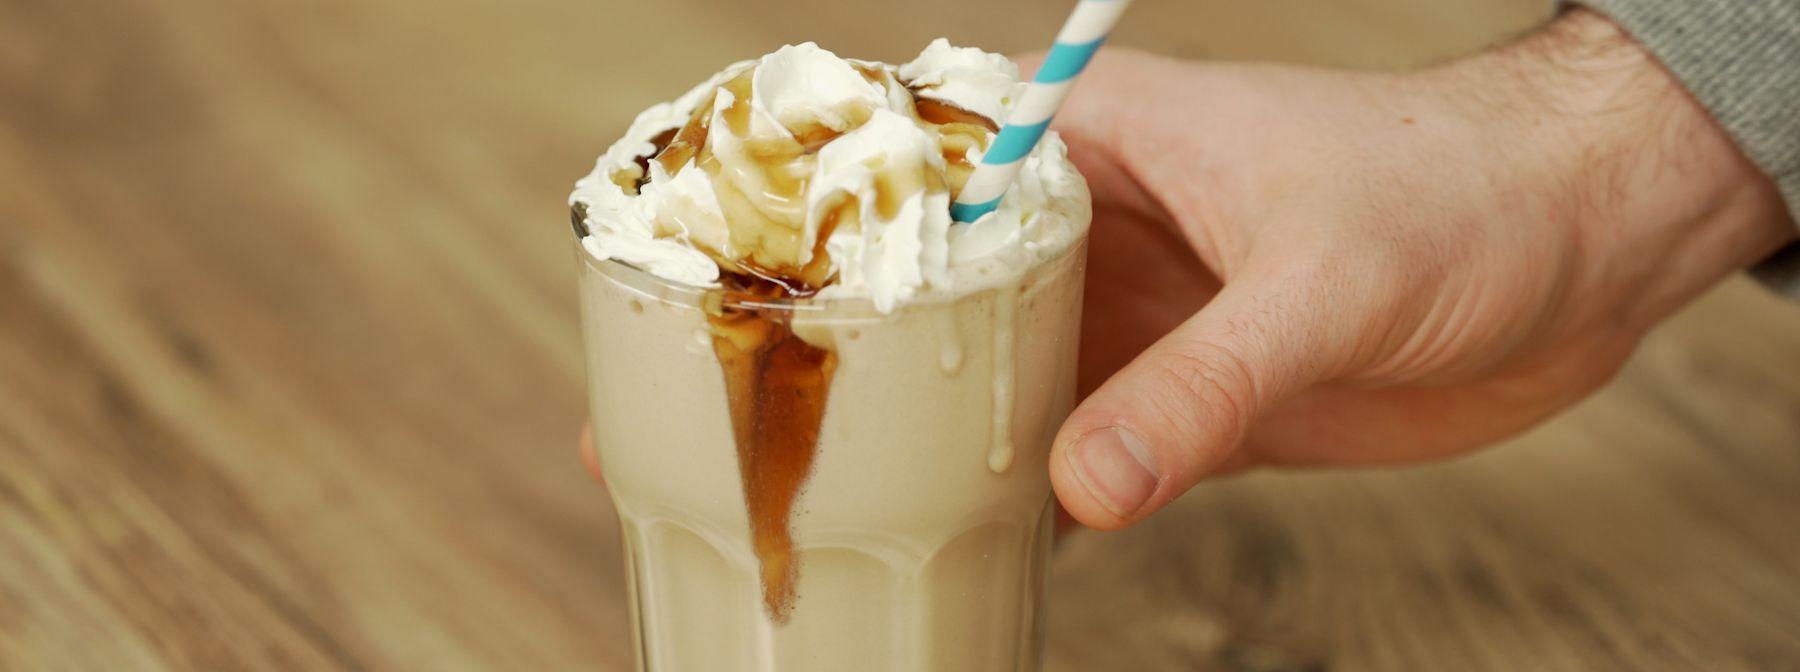 Proteinová ledová káva | Čokoládo-kokosové frappé